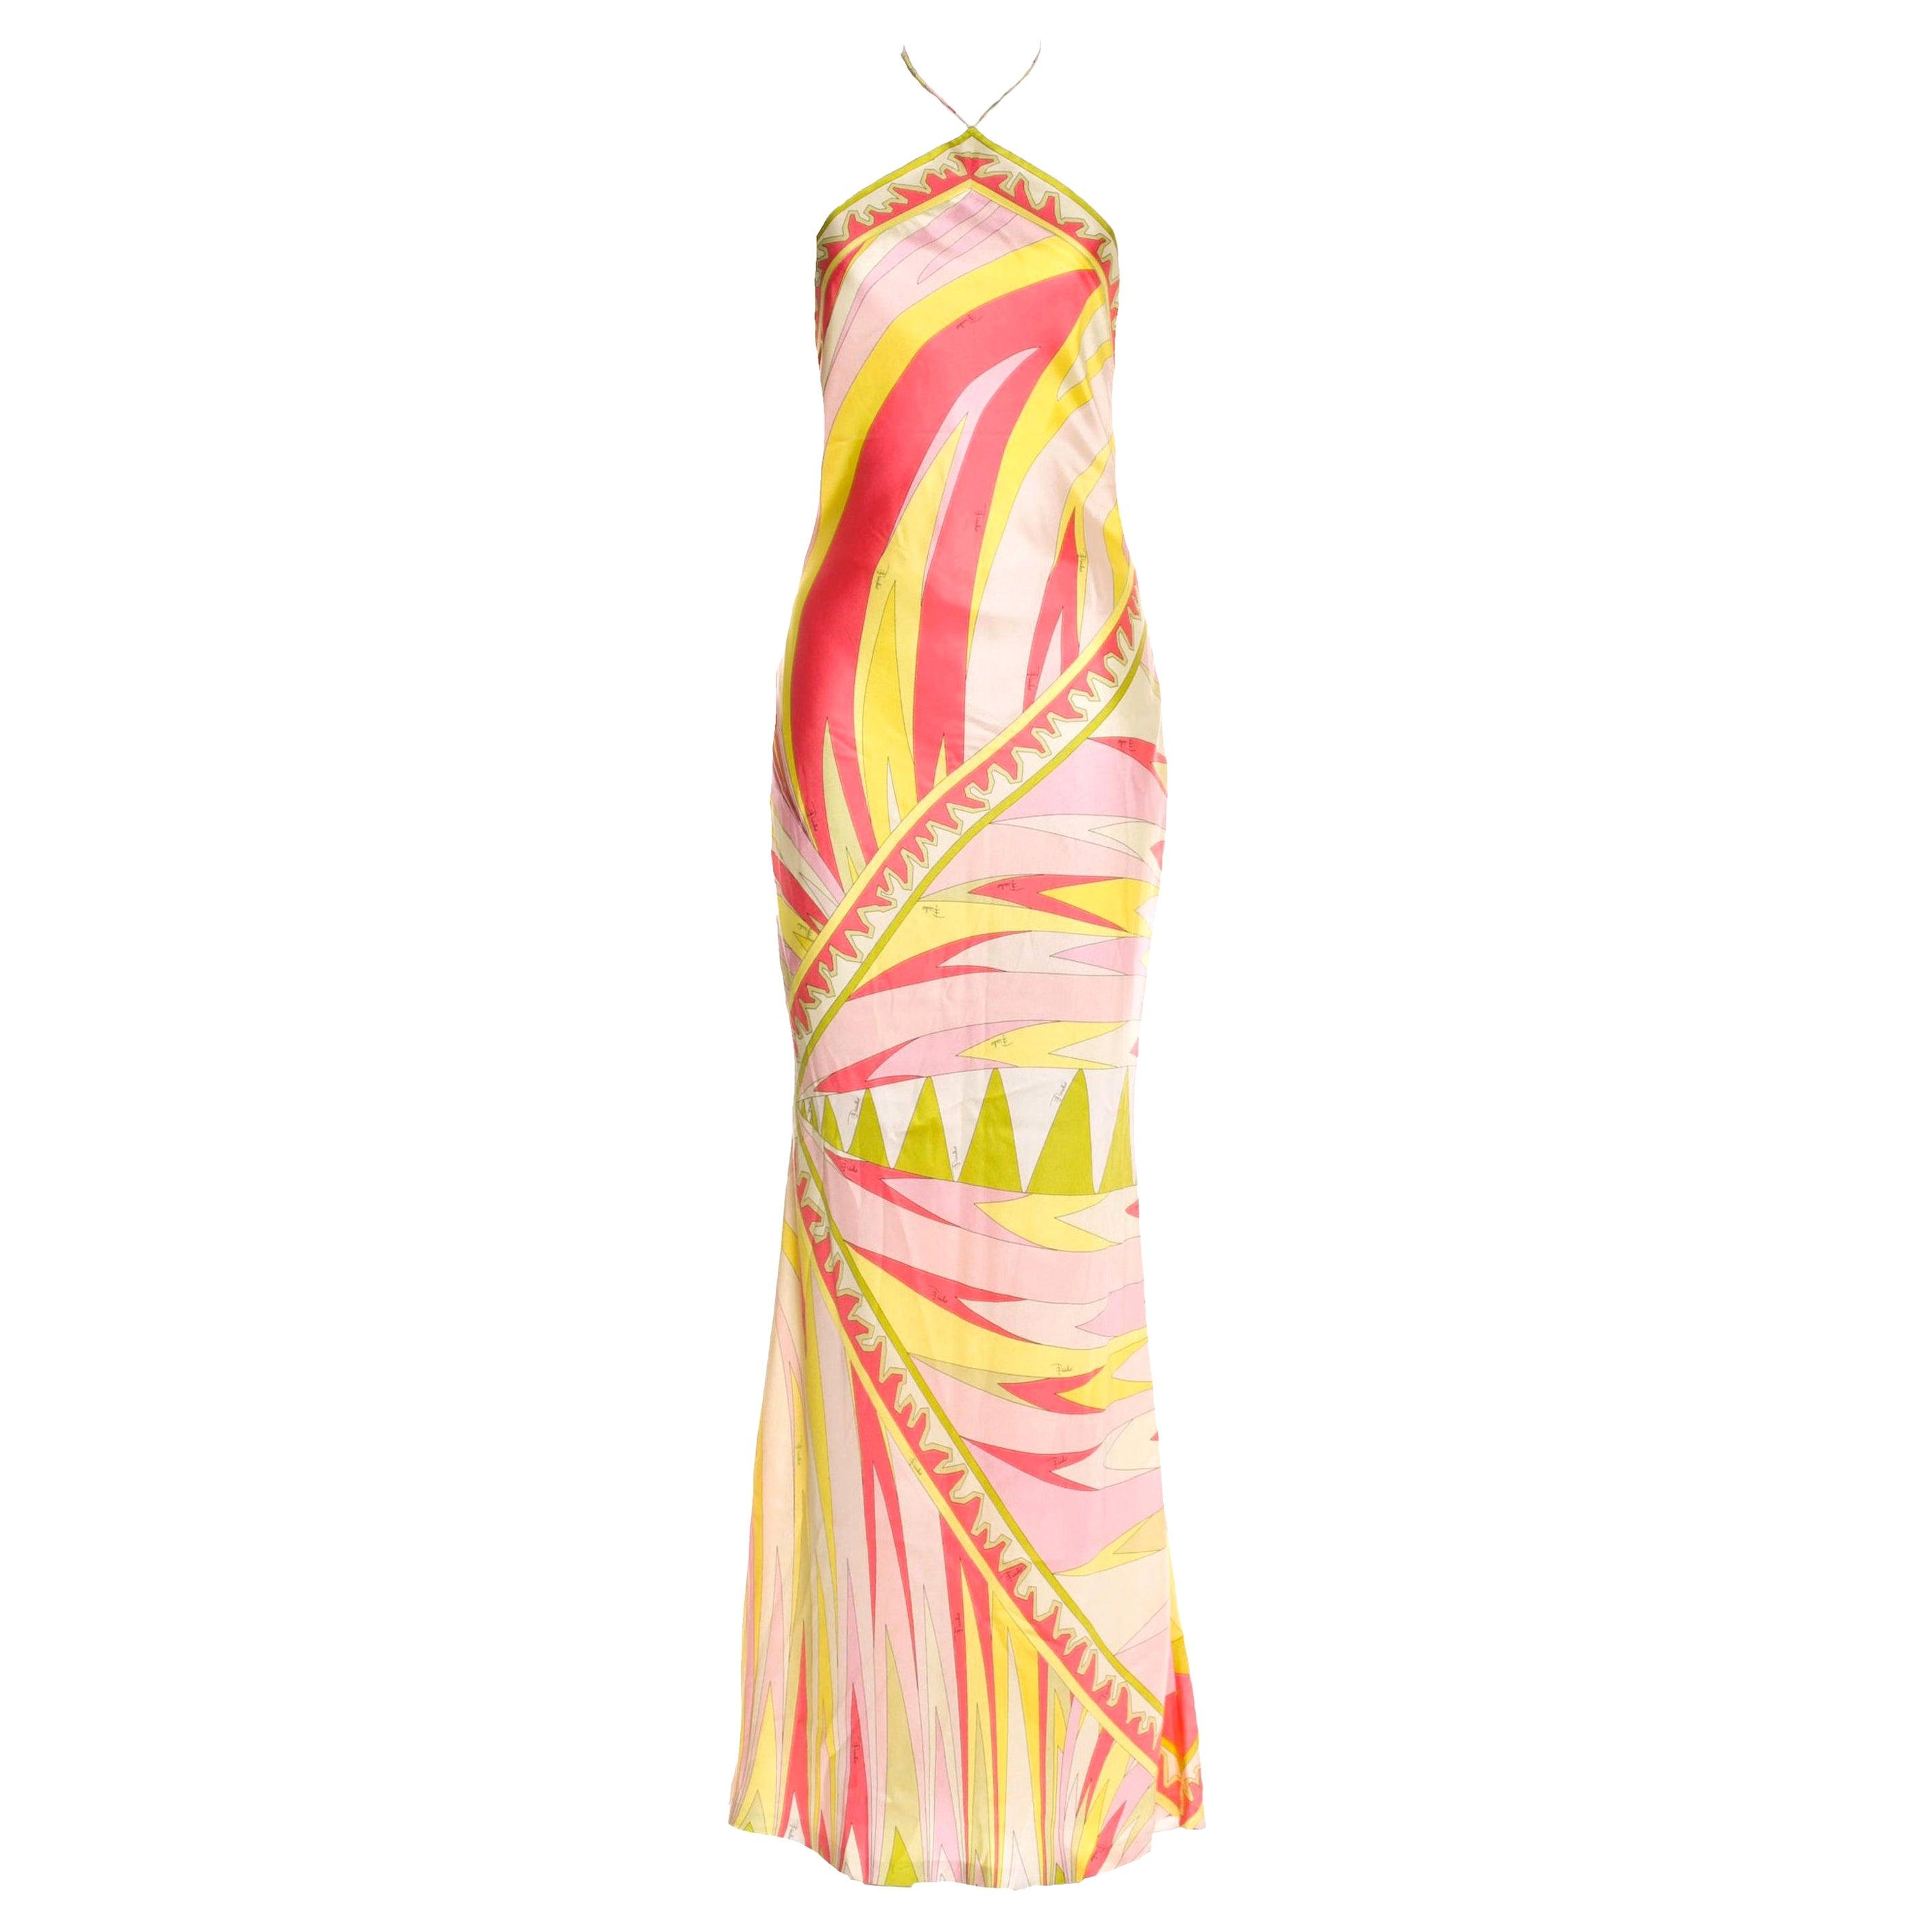 Emilio Pucci Signature Print Neckholder Open Back Evening Maxi Dress Gown